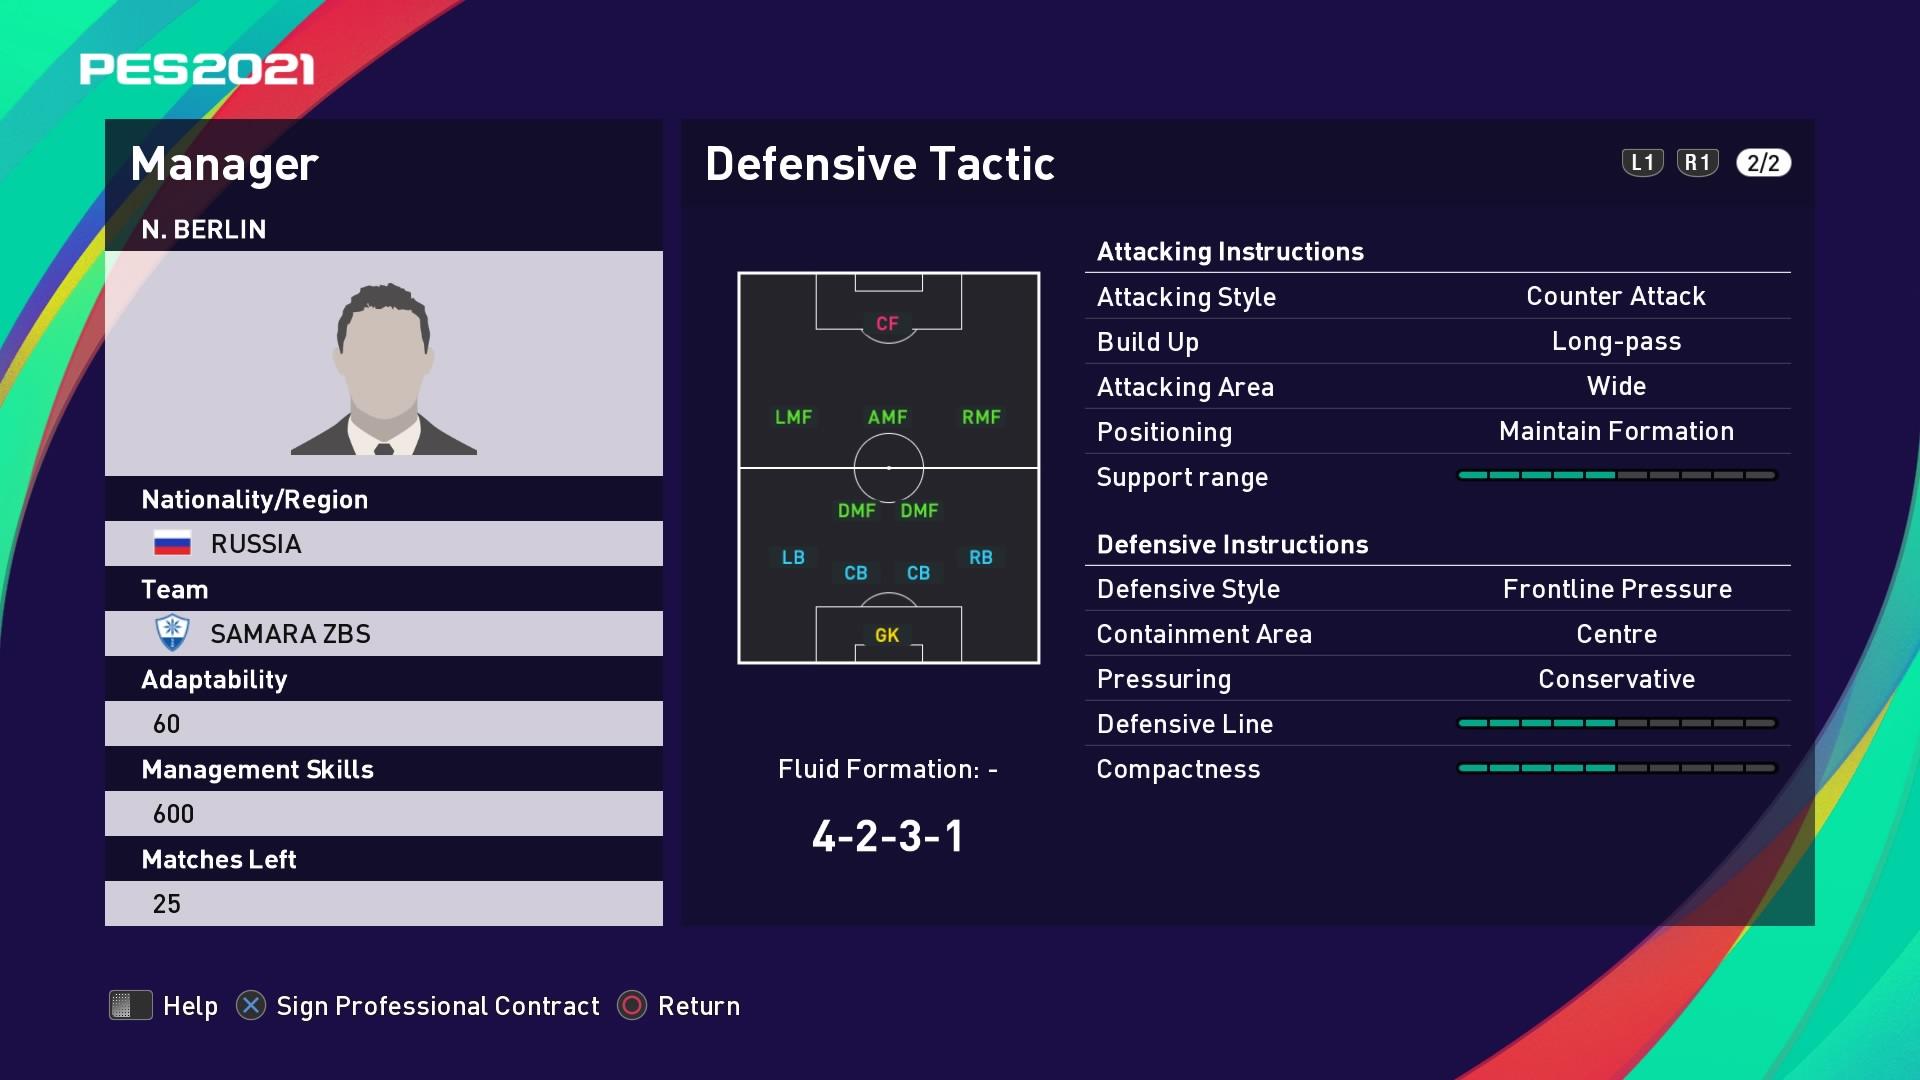 N. Berlin ( Igor Osinkin) Defensive Tactic in PES 2021 myClub